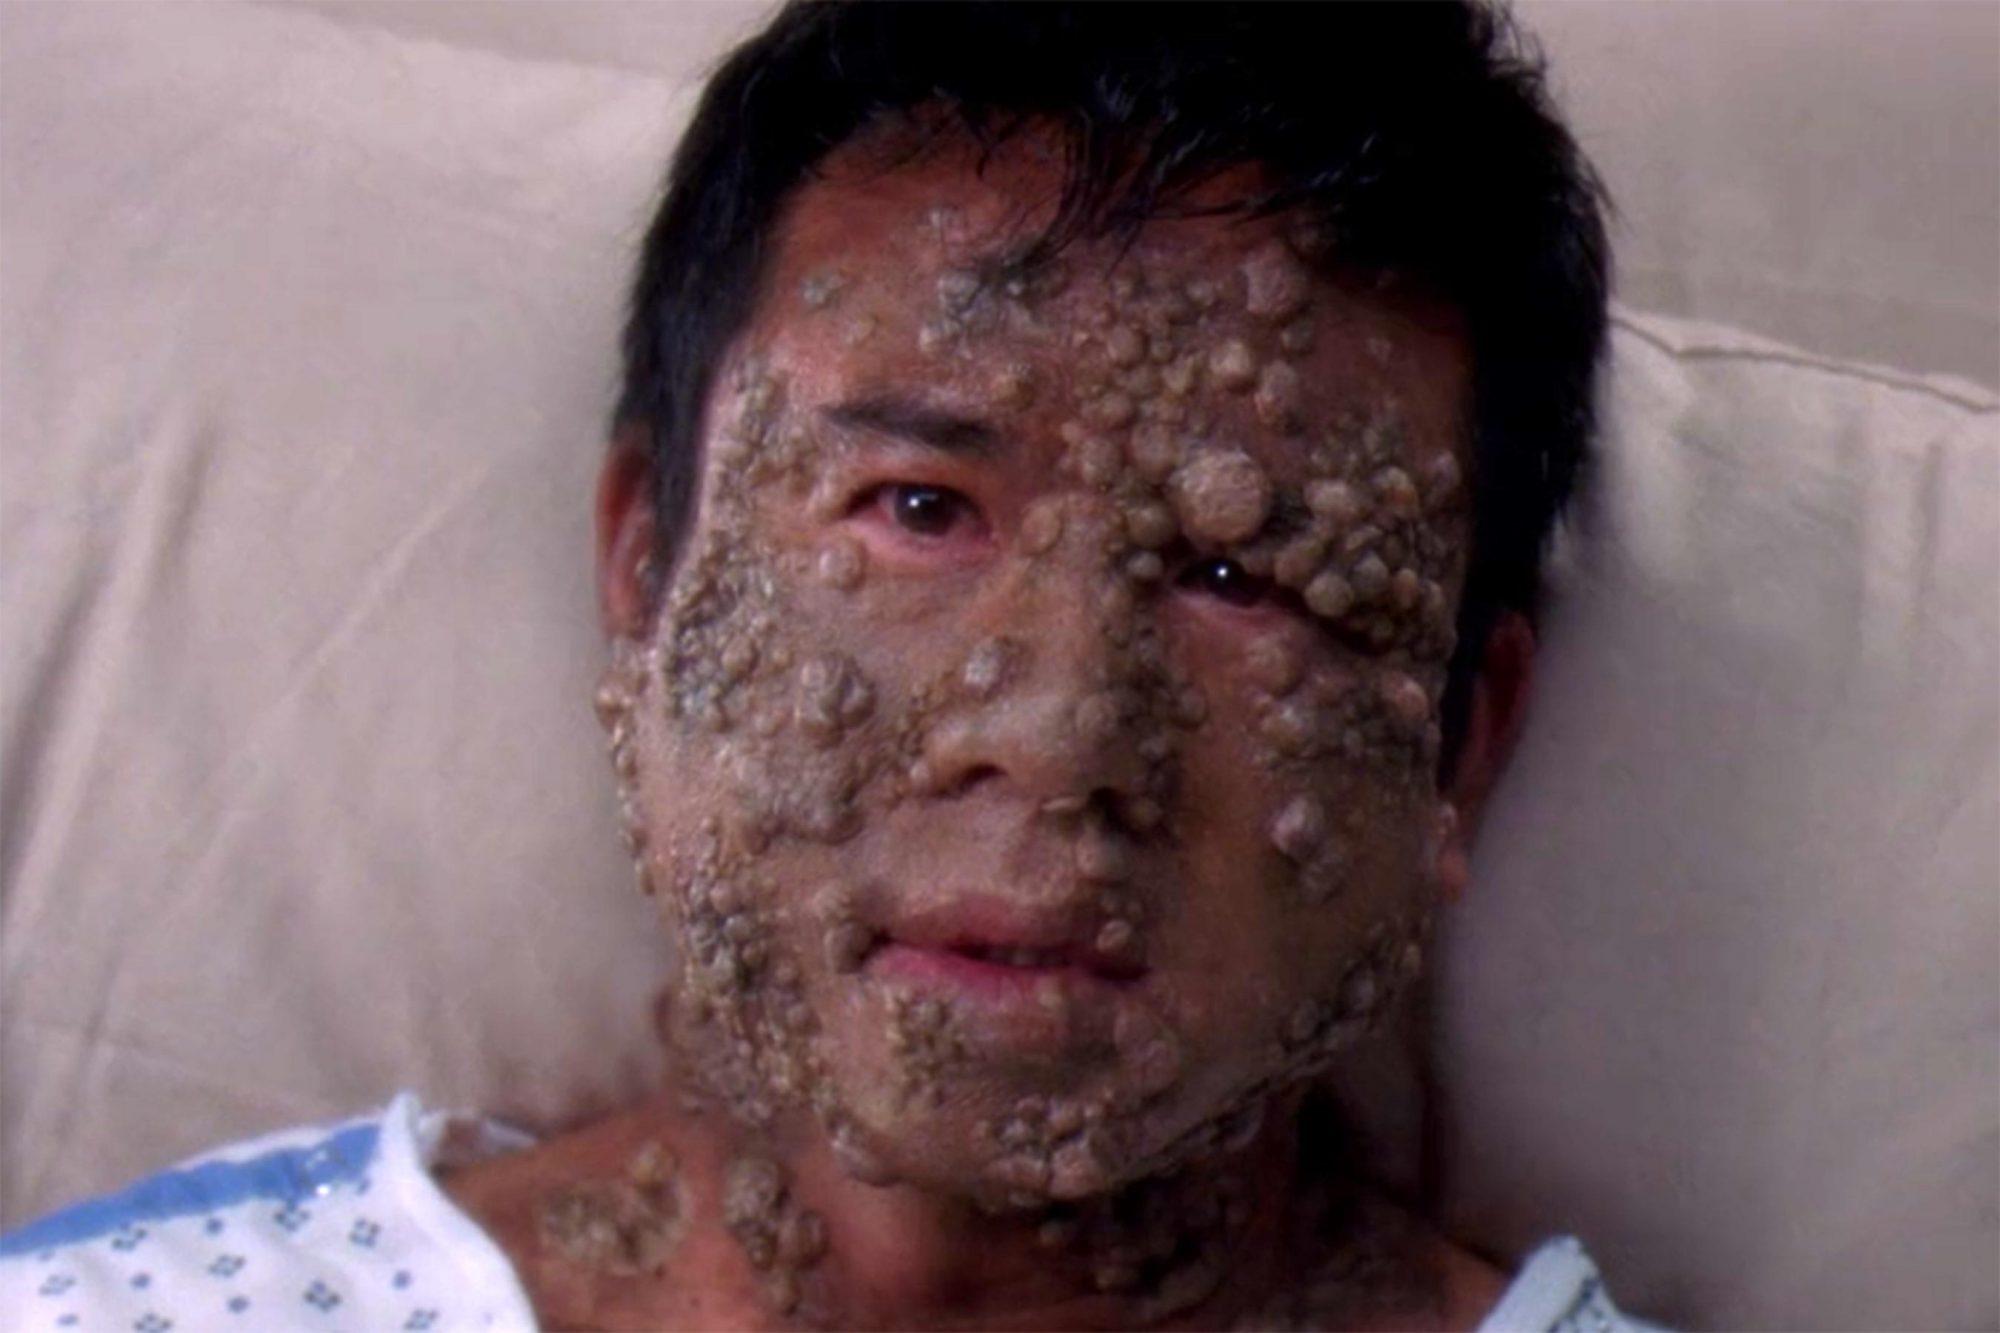 Grey's Anatomy screen grabWeirdest Medical CasesCredit: ABC